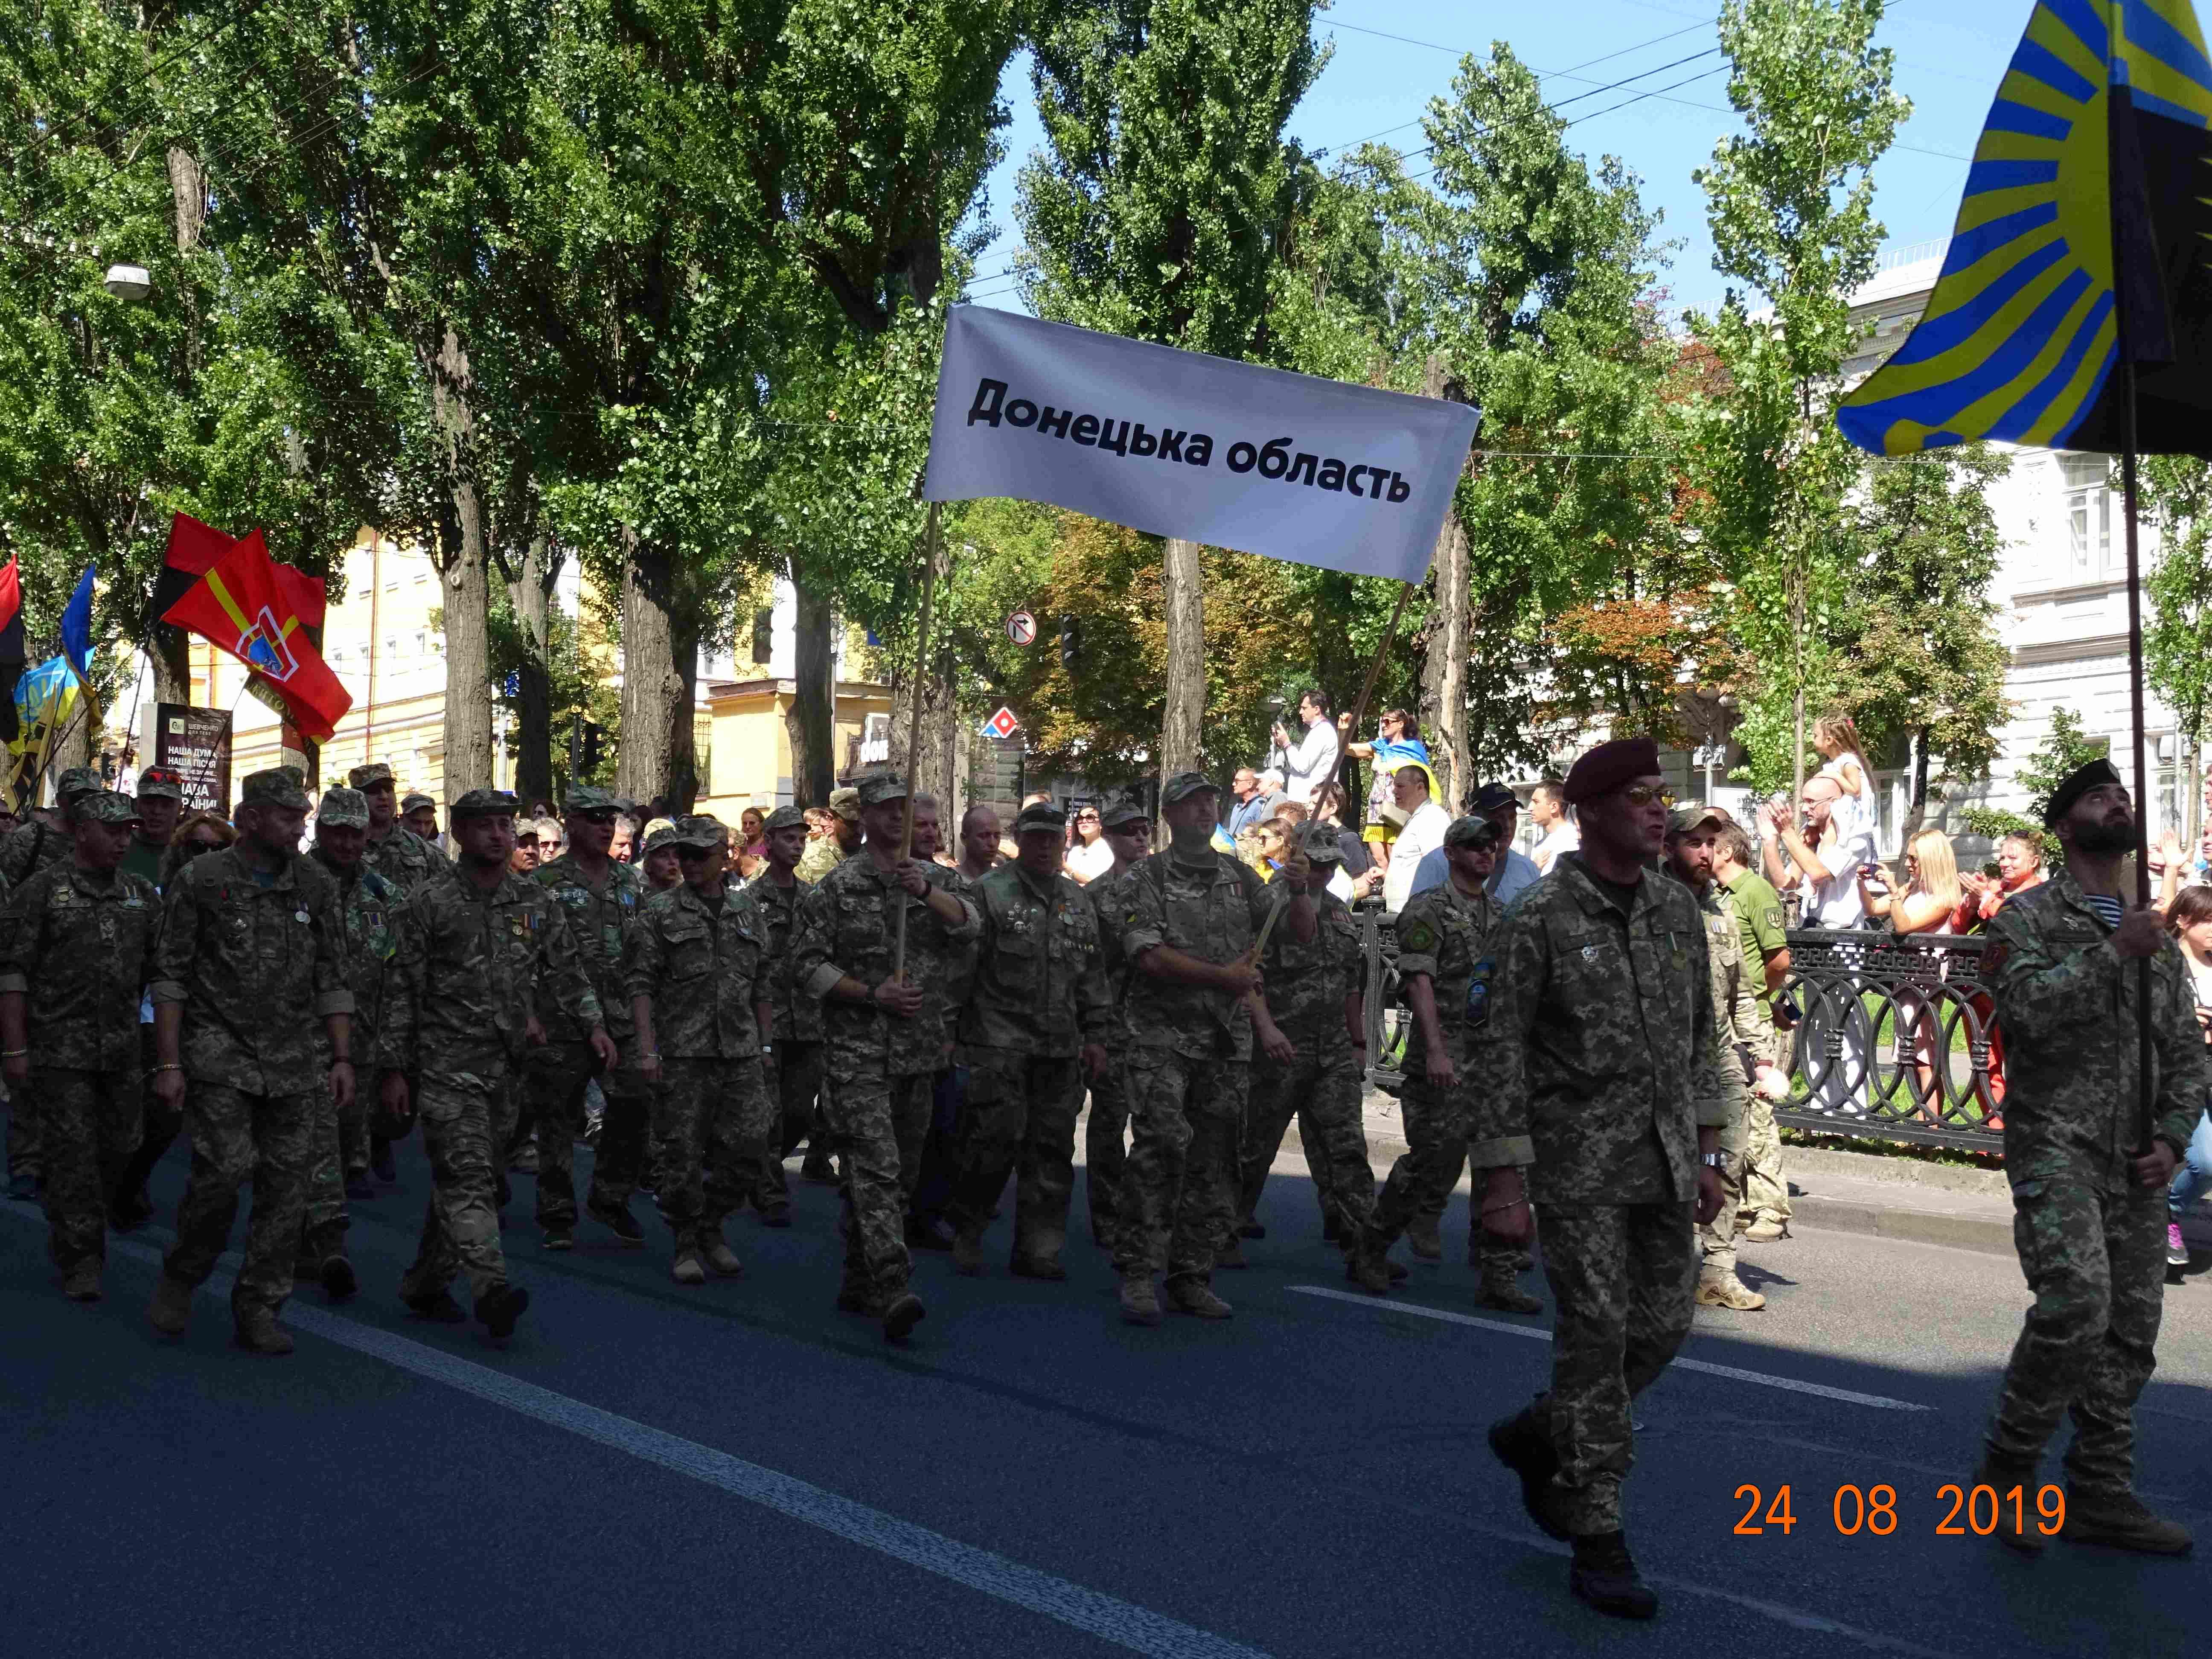 Defenders-of-Ukraine-Parad-24.Aug.19 - DSC06114.jpg